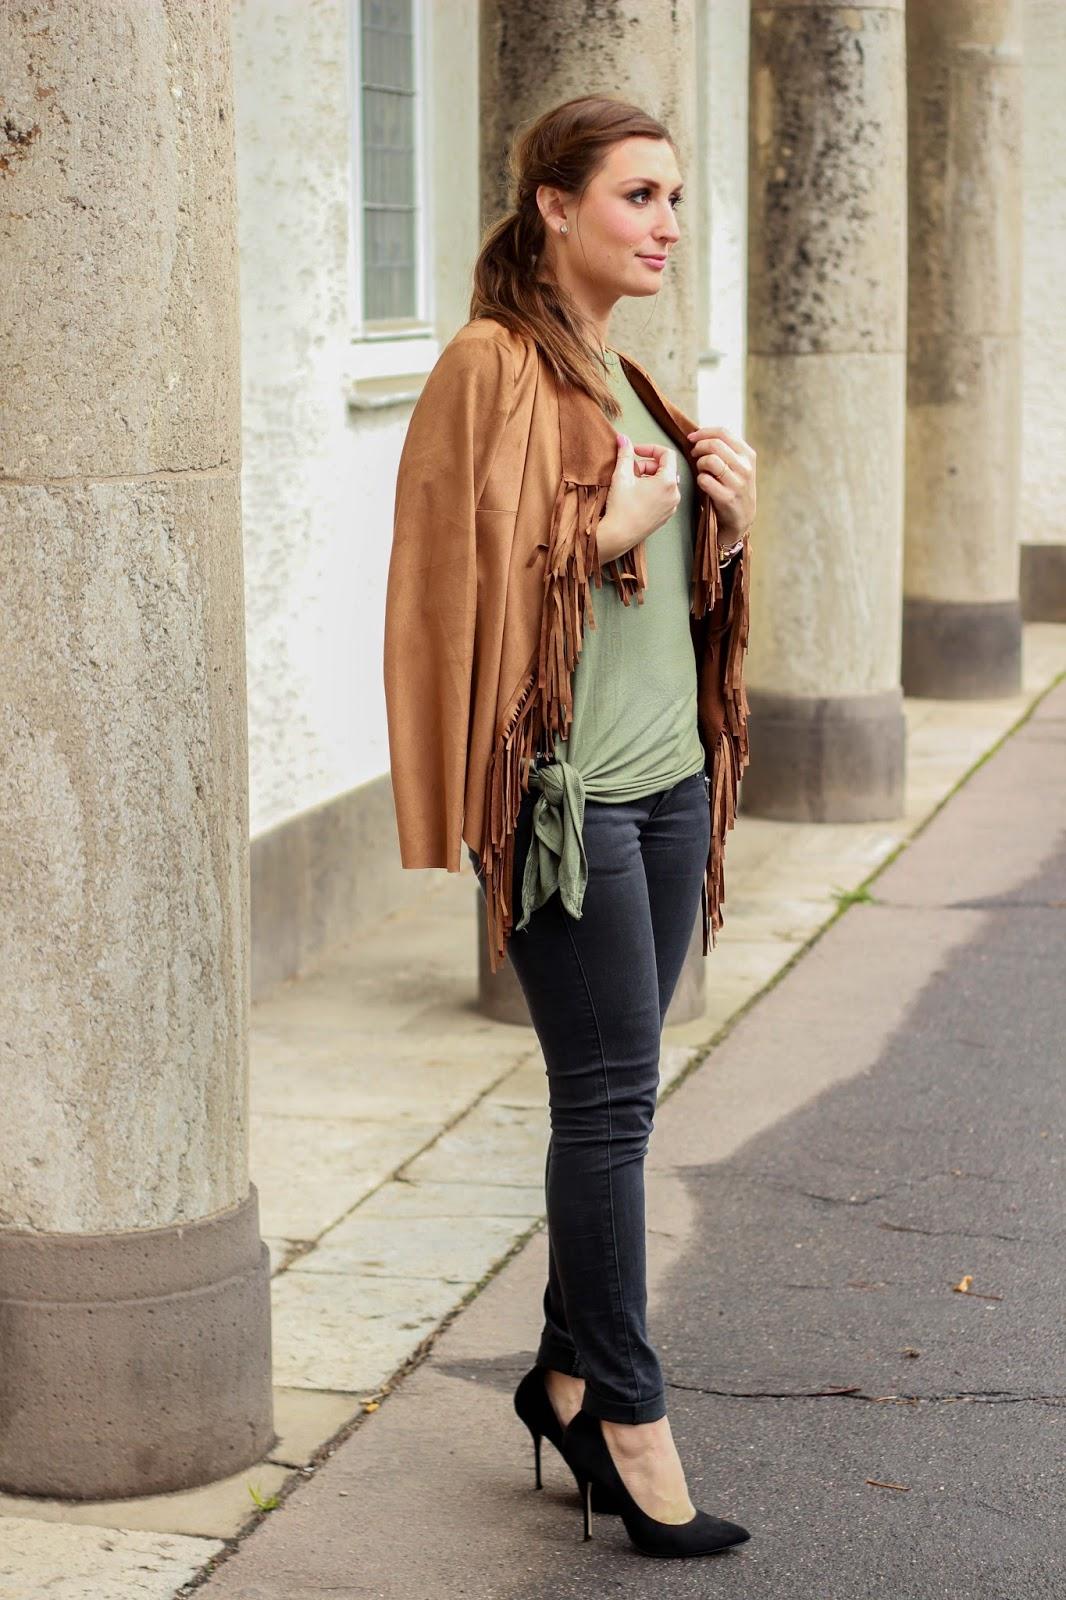 Fashionblogger from Germany - german fashion blogger -fashionblog - german fashionblogger - fashionstylebyjohanna - deutsche fashionblogger